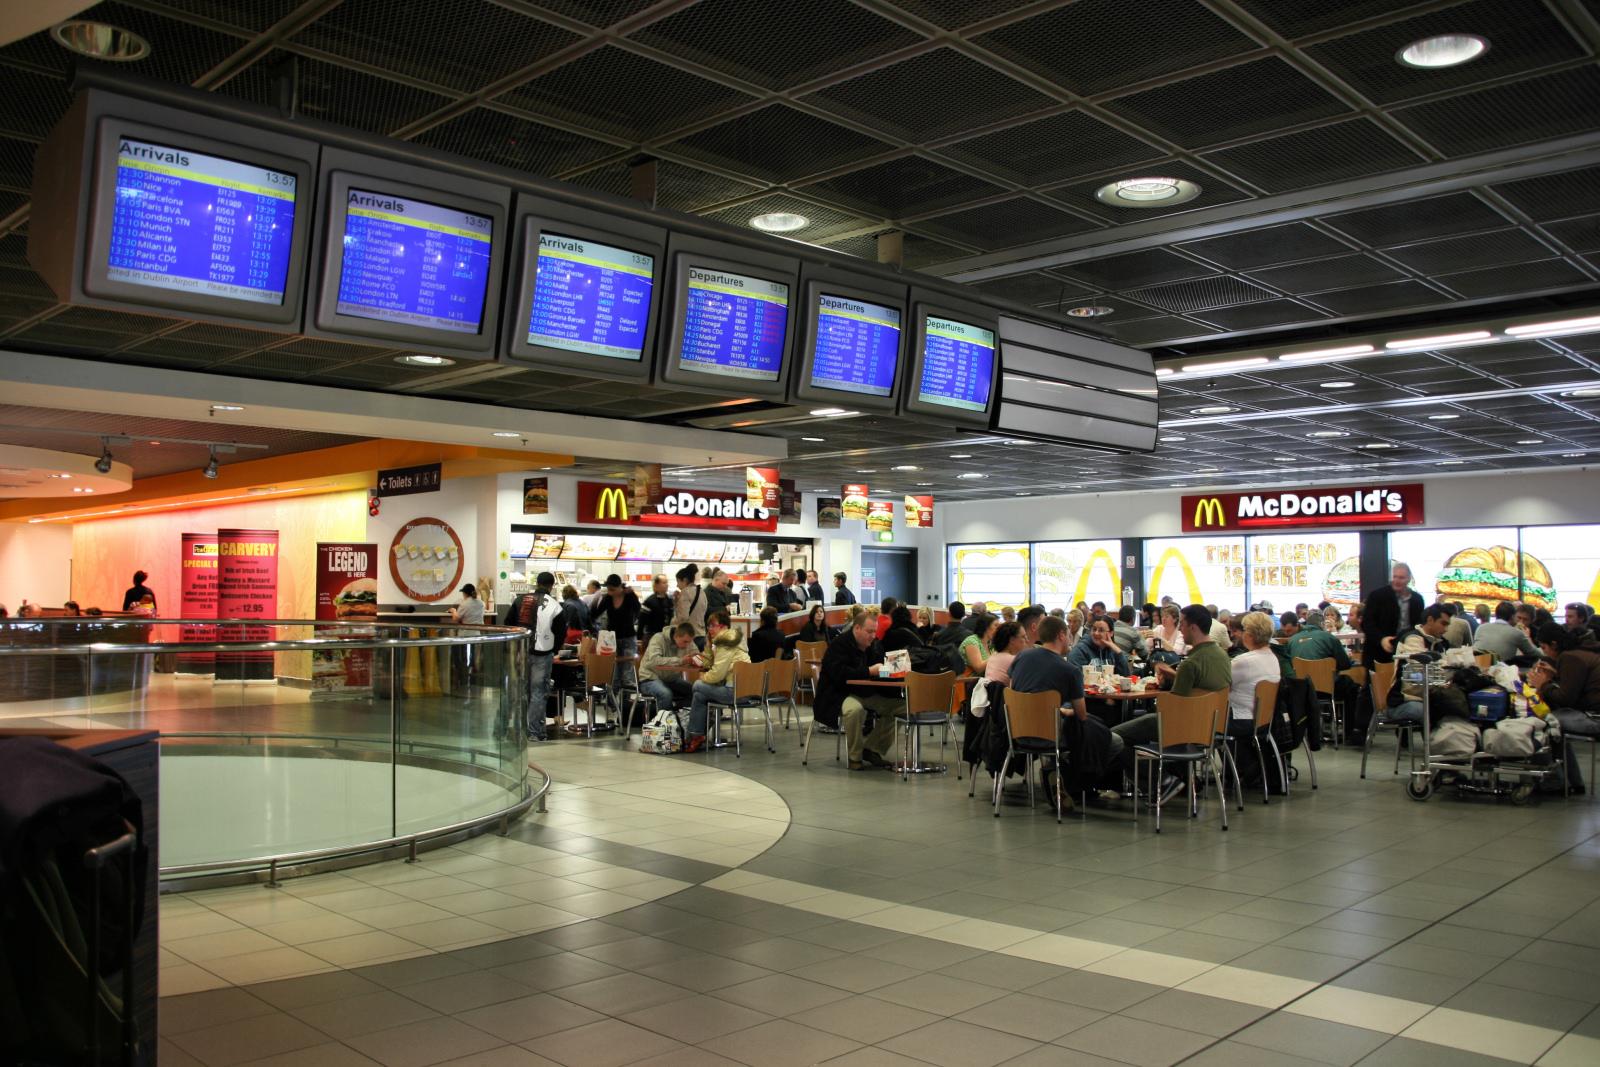 FileDublin Airport McDonalds Restaurantjpg Wikipedia